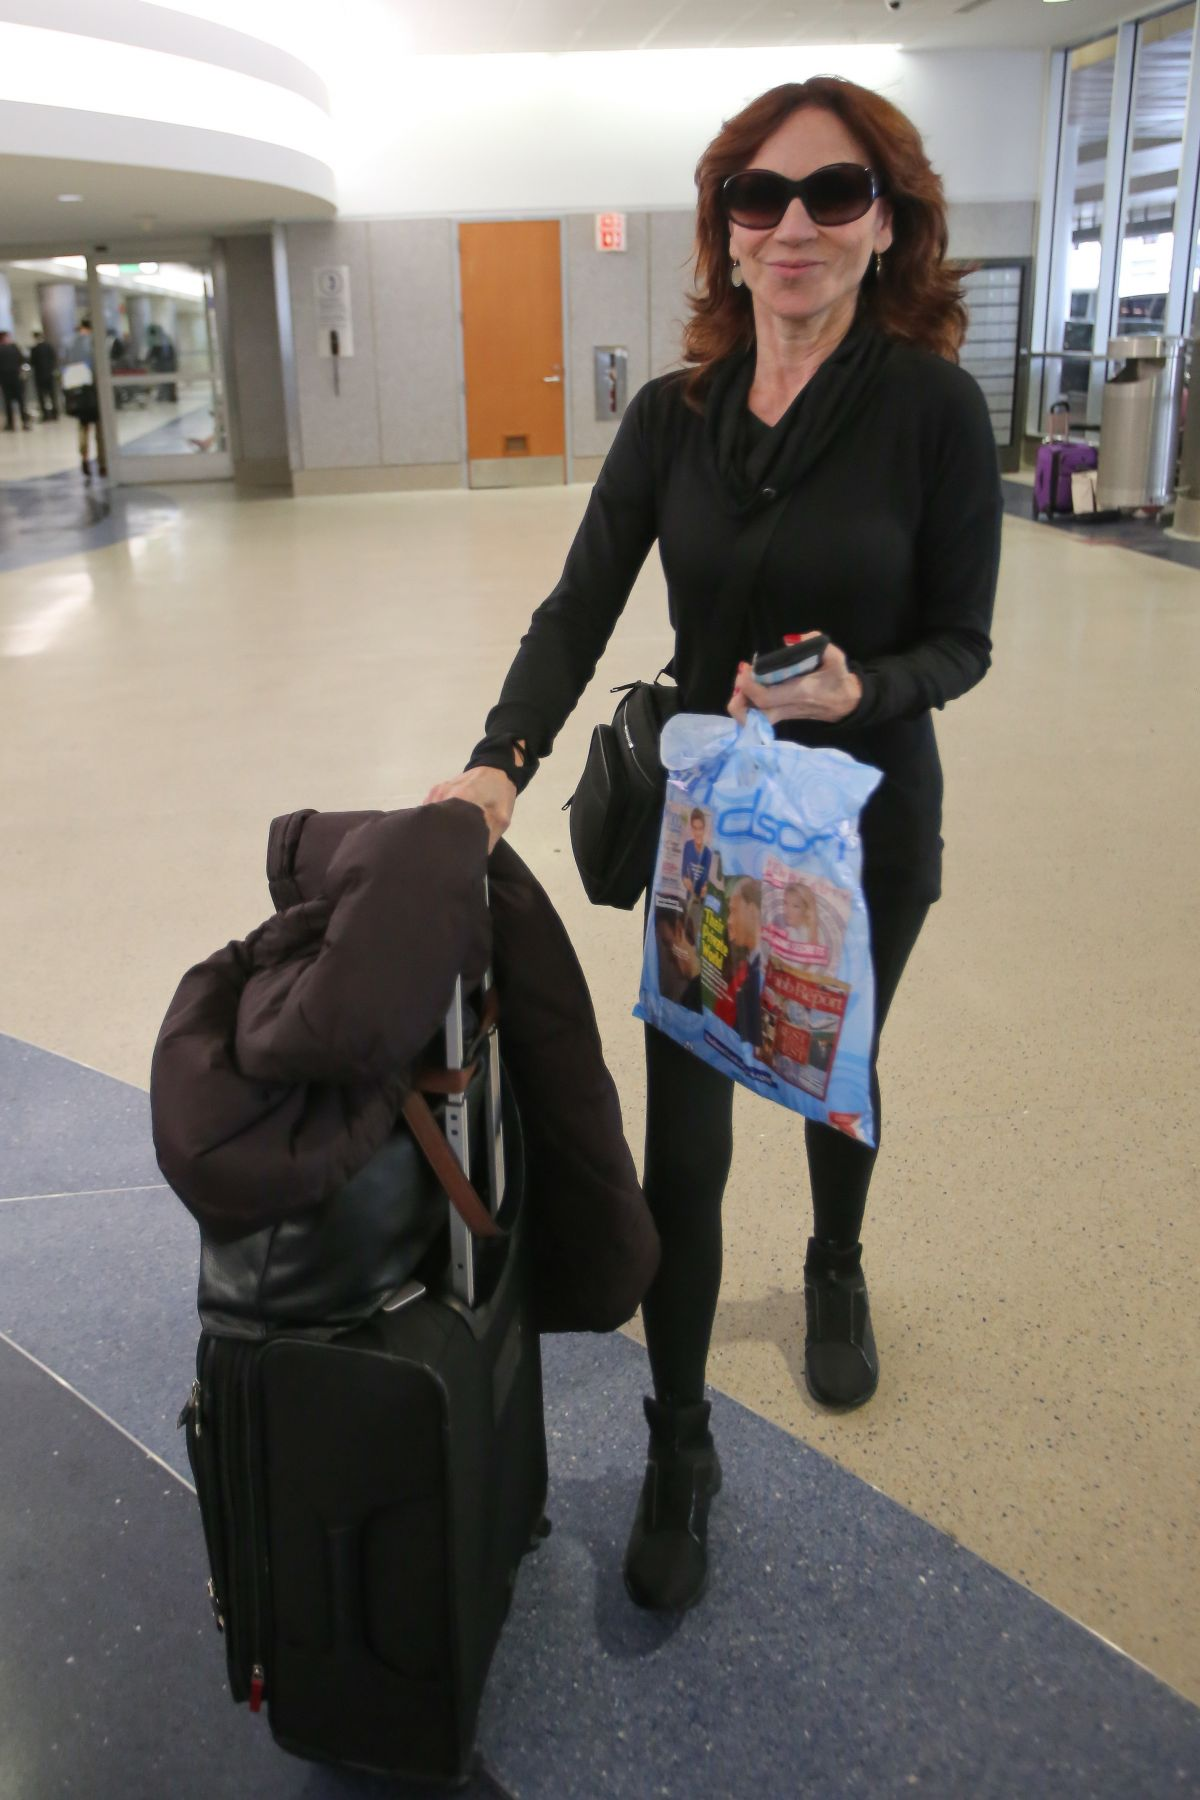 MARILU HENNER at Los Angeles International Airport 12/15/2016